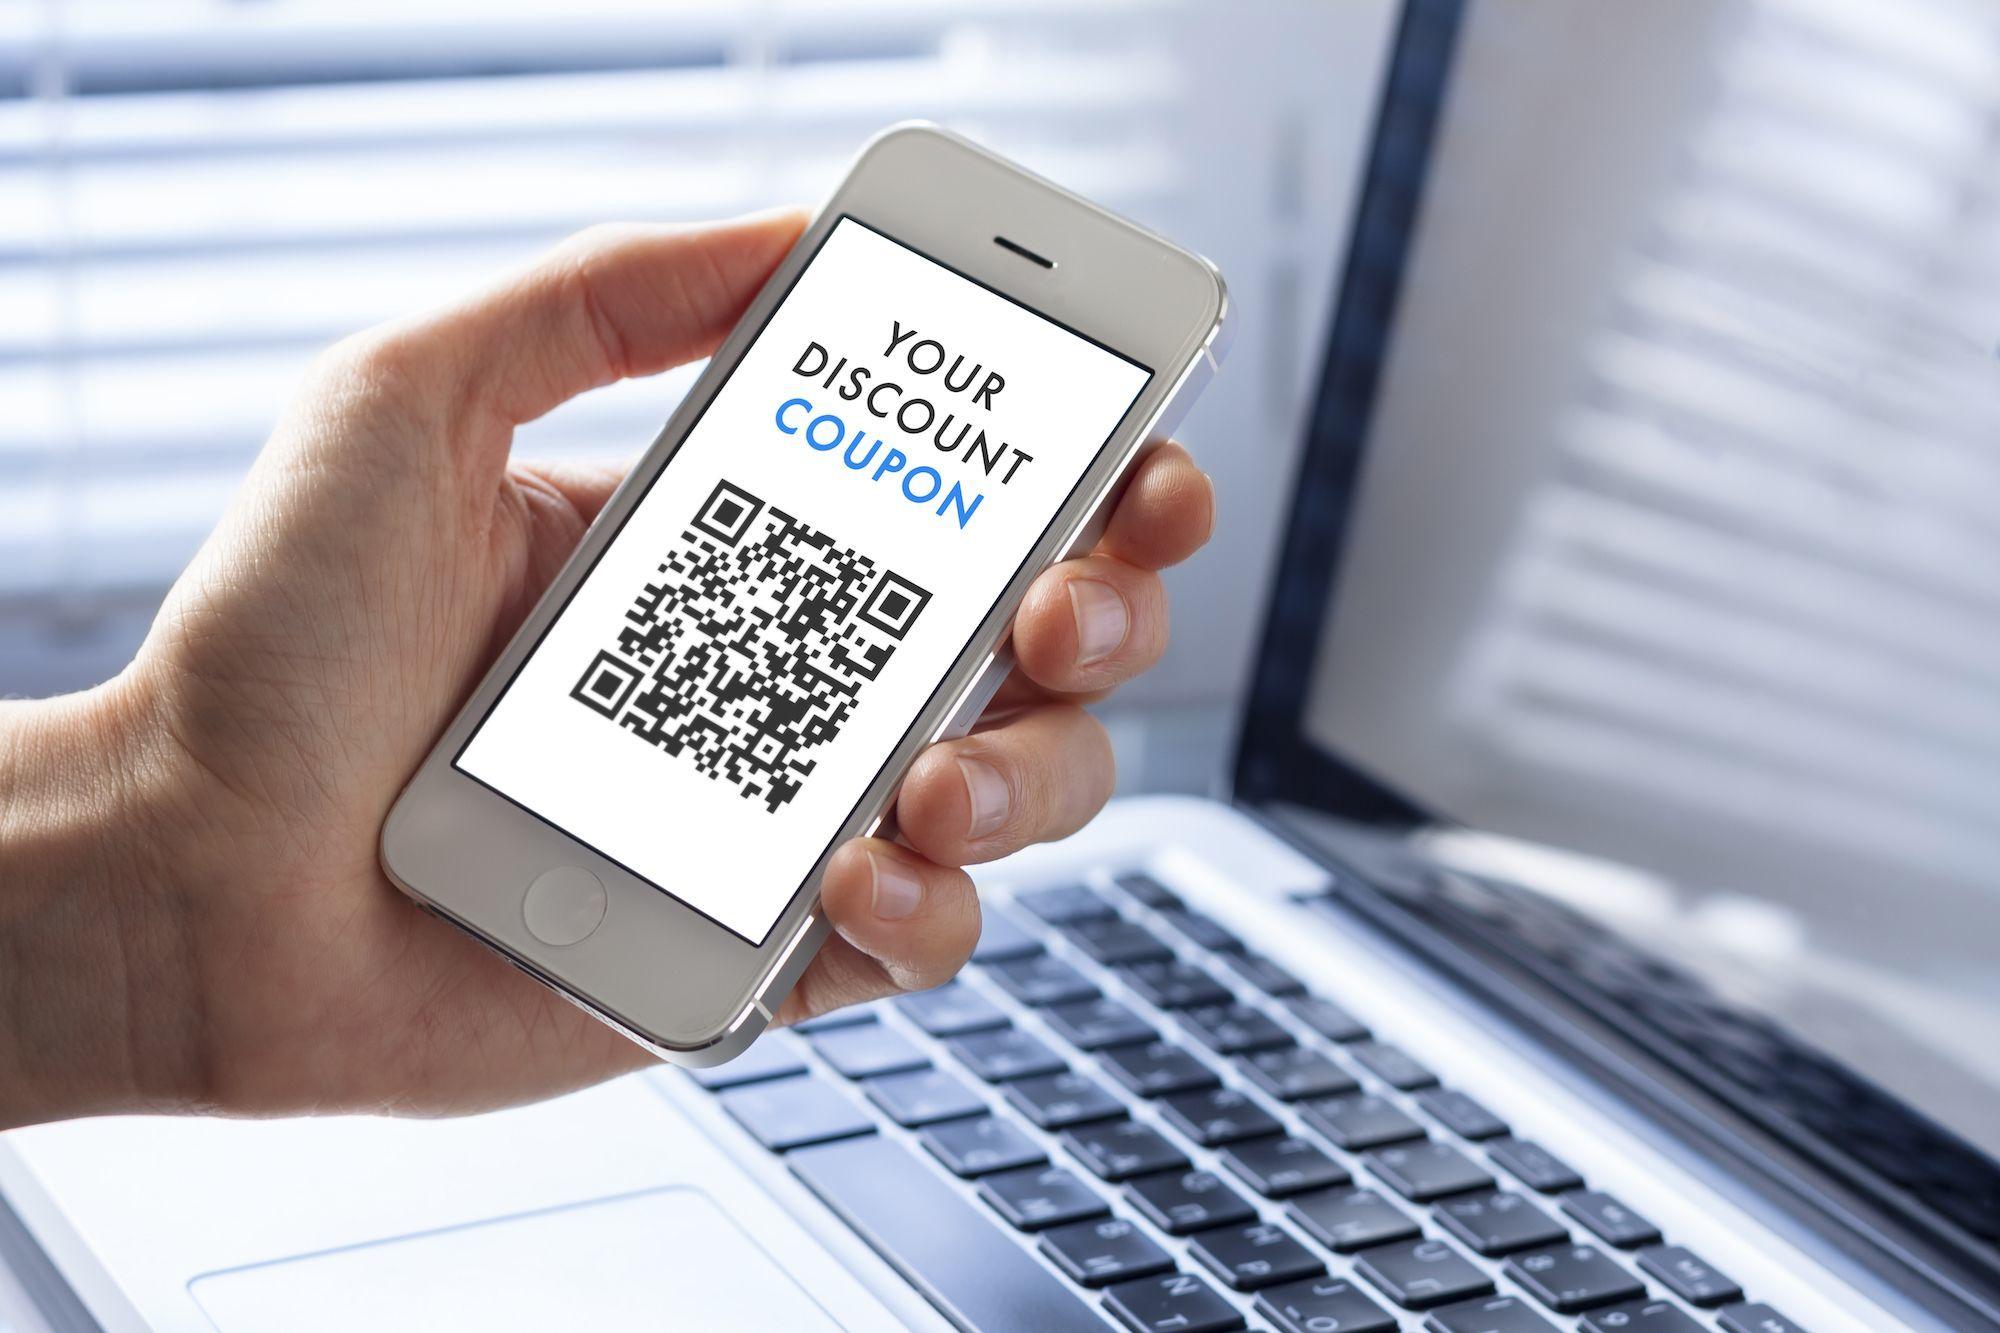 QR digital coupon code